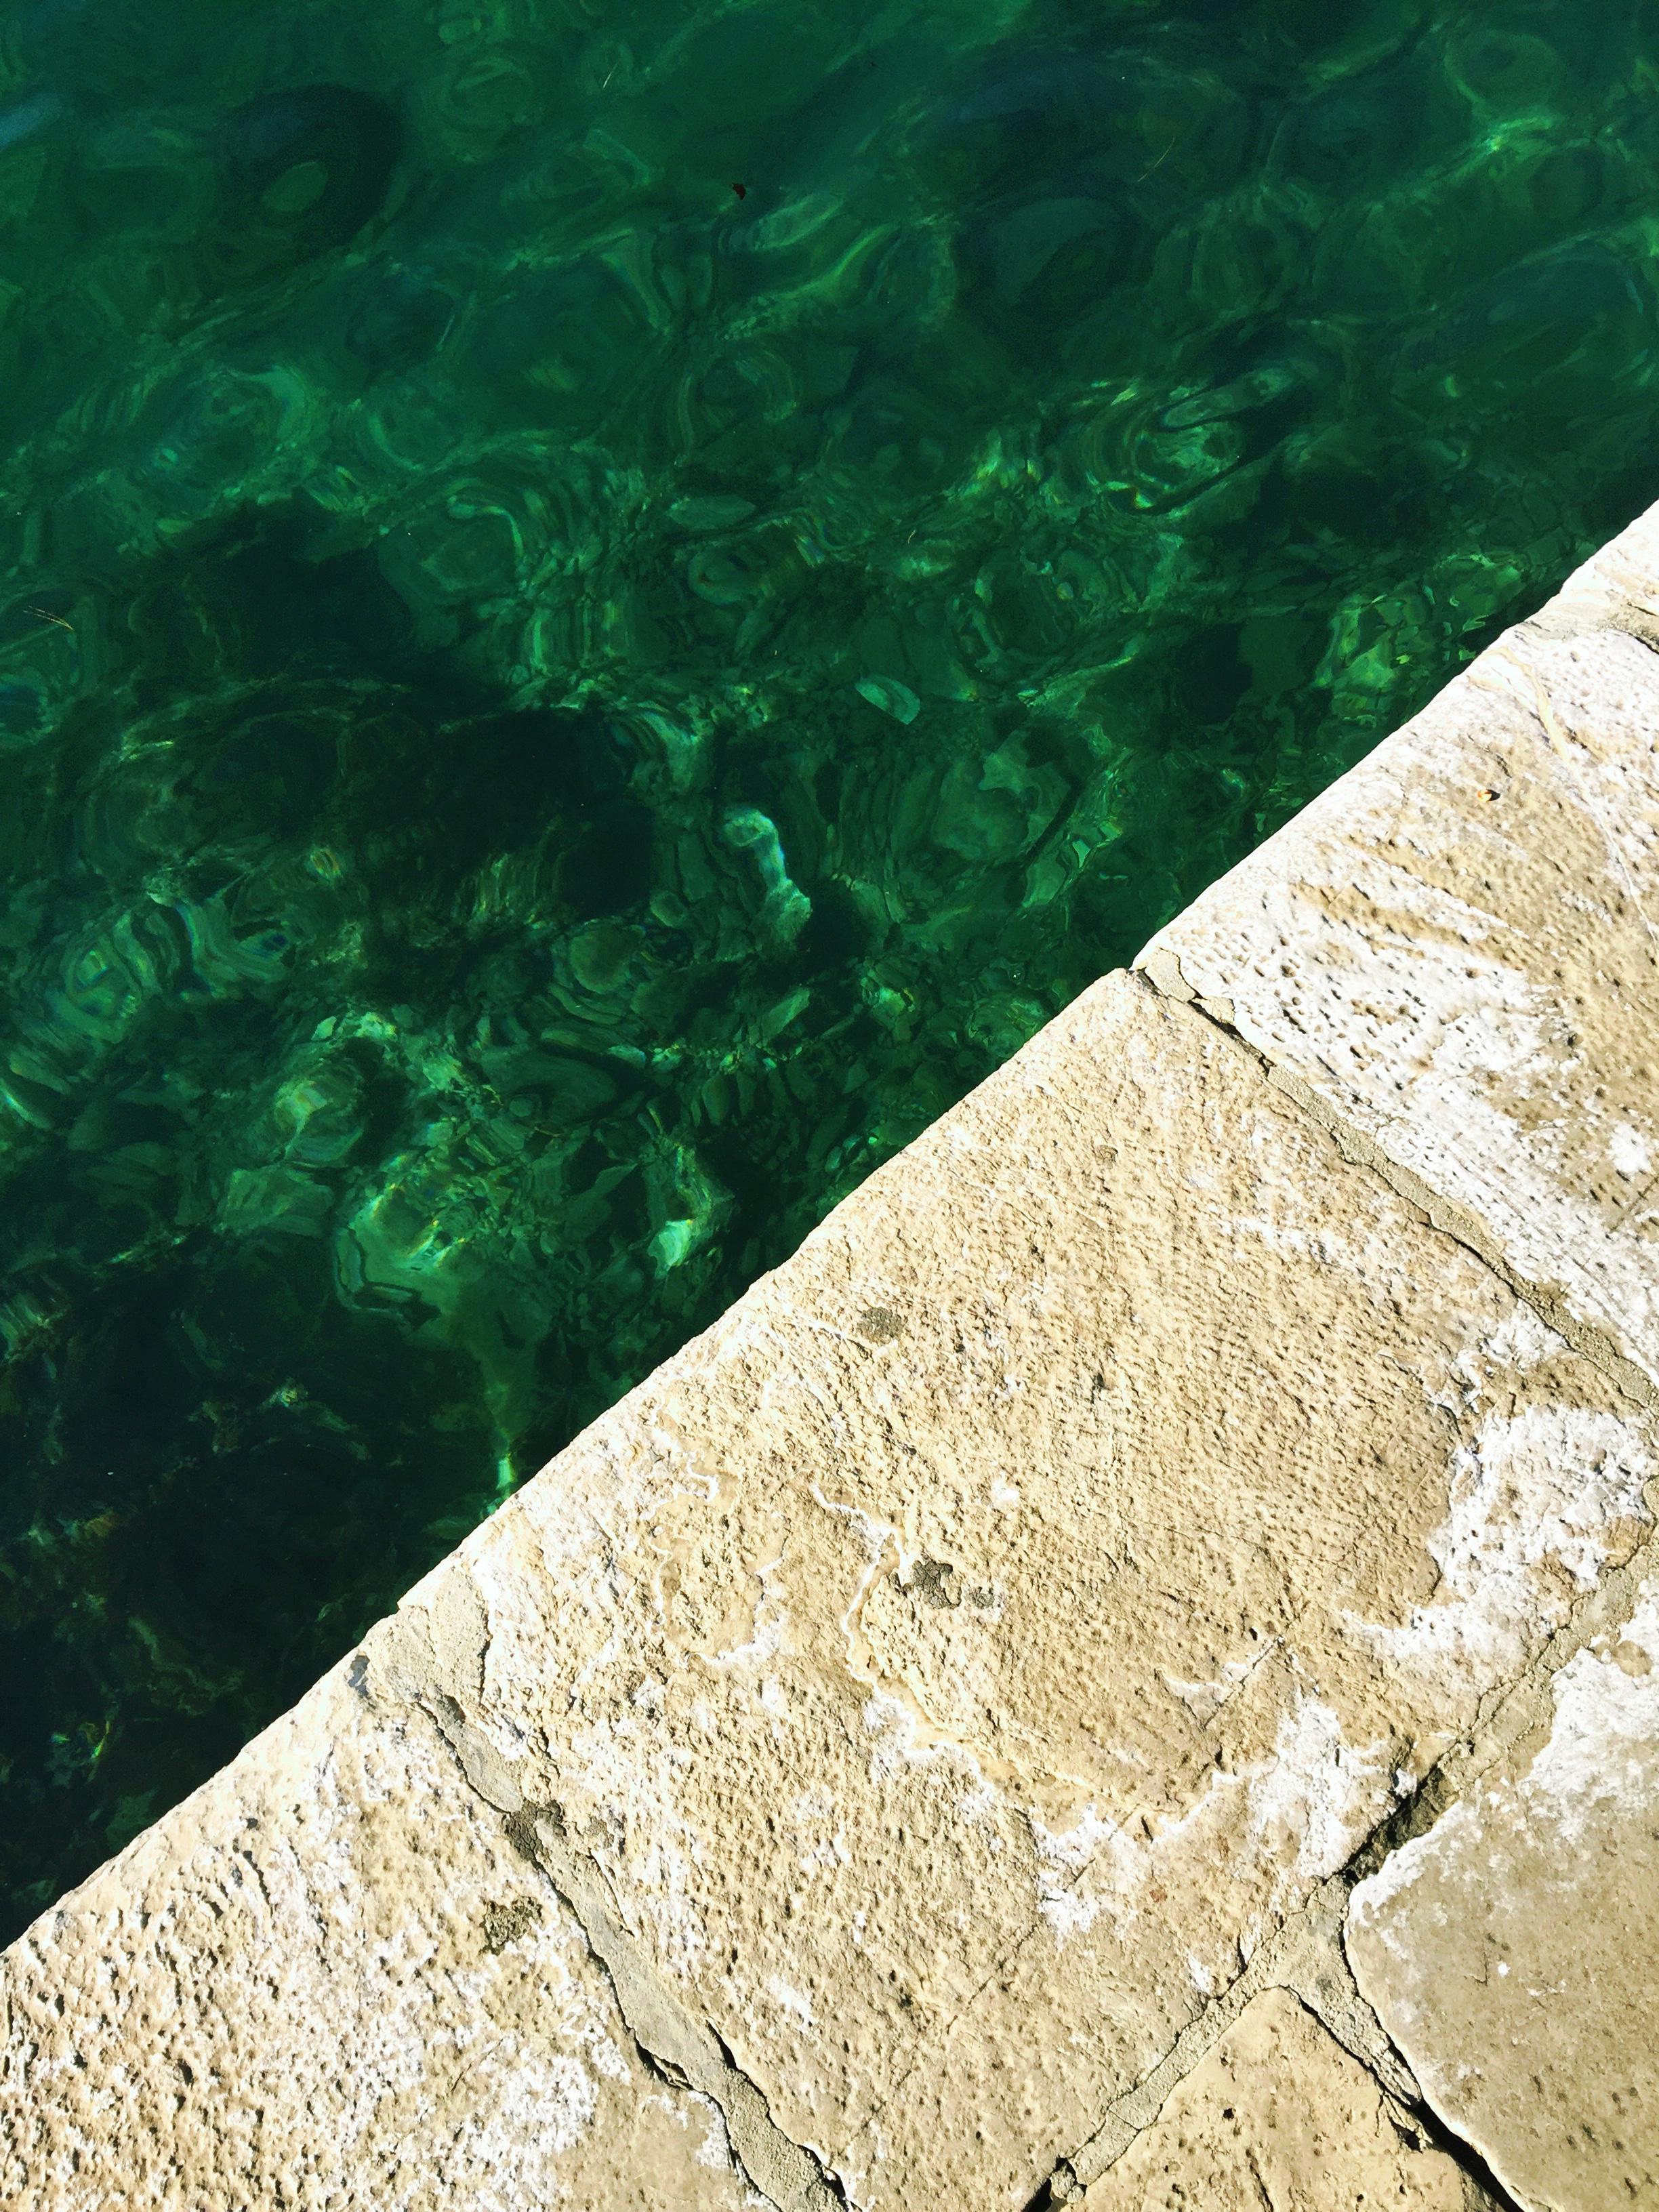 beautiful emerald-hued water